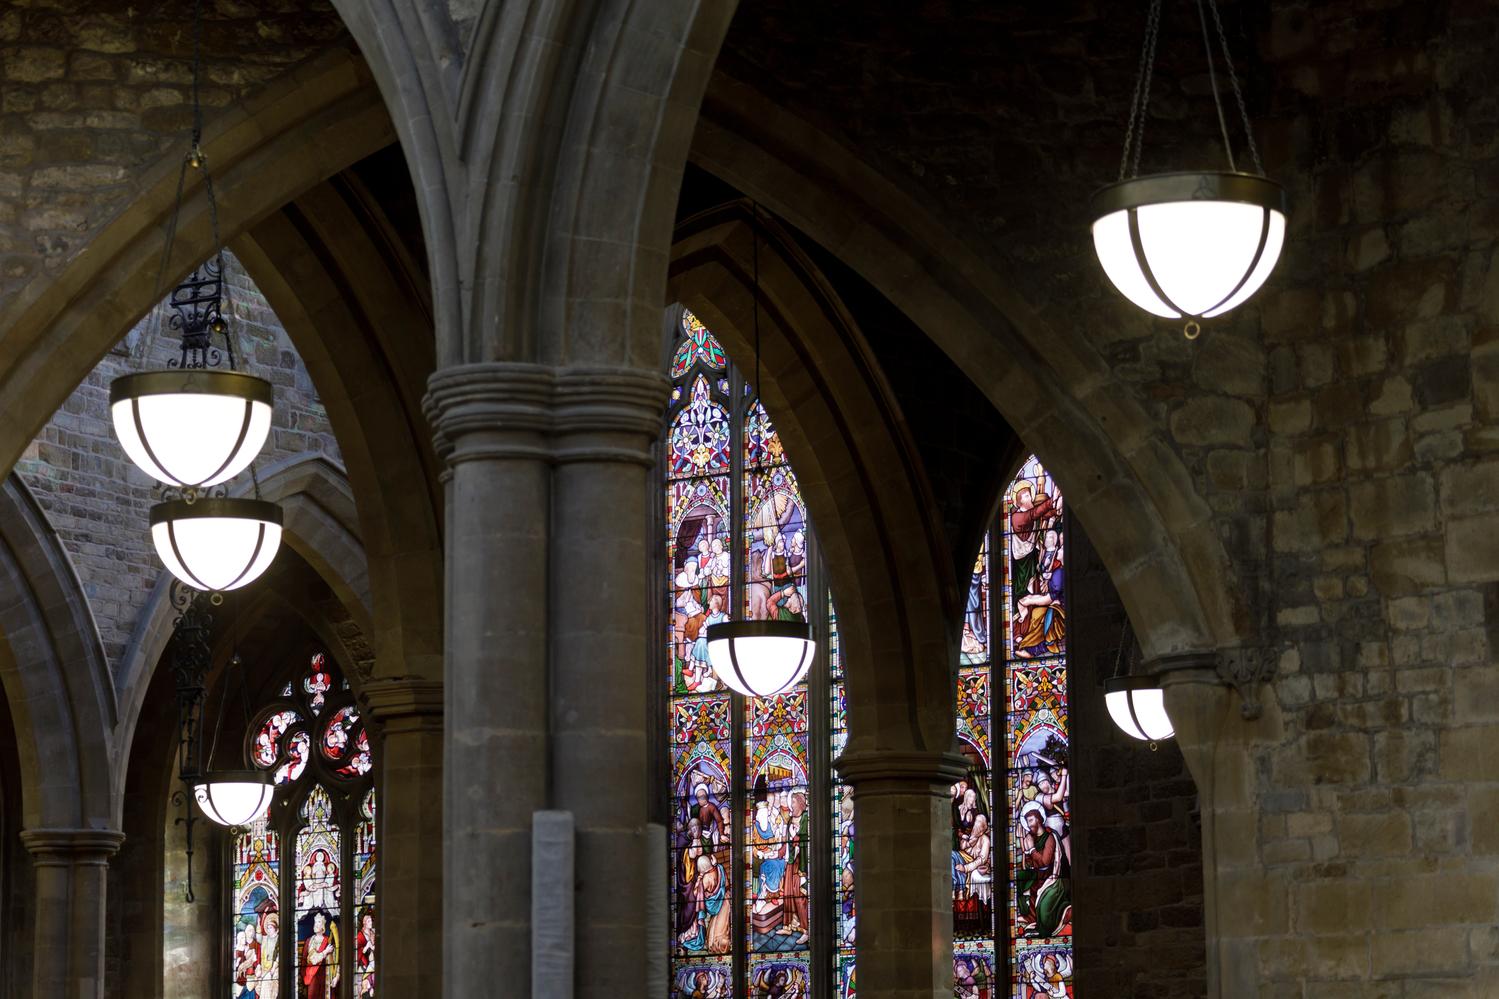 St Mary's church, Melton Mowbray - new pendant lighting